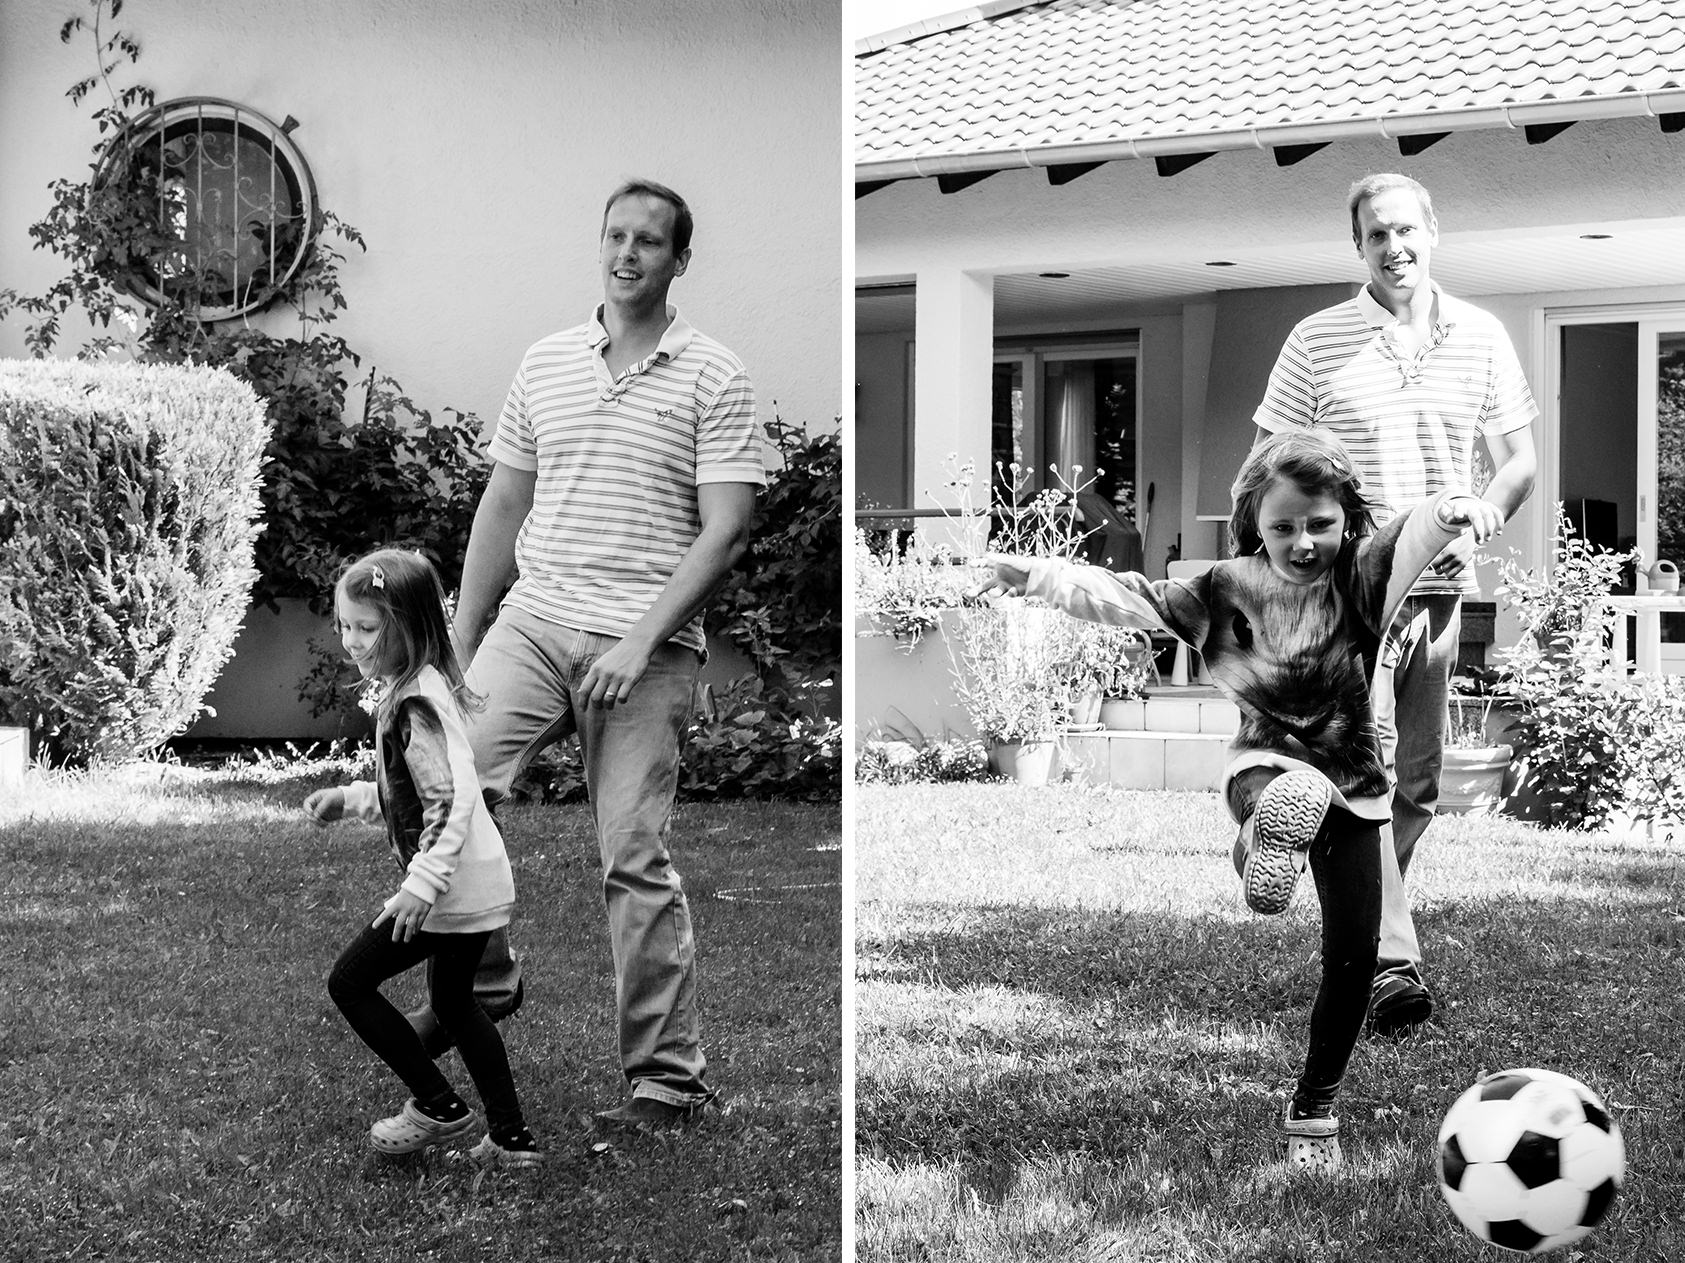 familienfotograf-darmstadt-familienfotografie-familienfotos-homestory-fotoreportage-katharina-zwerger-fotograf-darmstadt